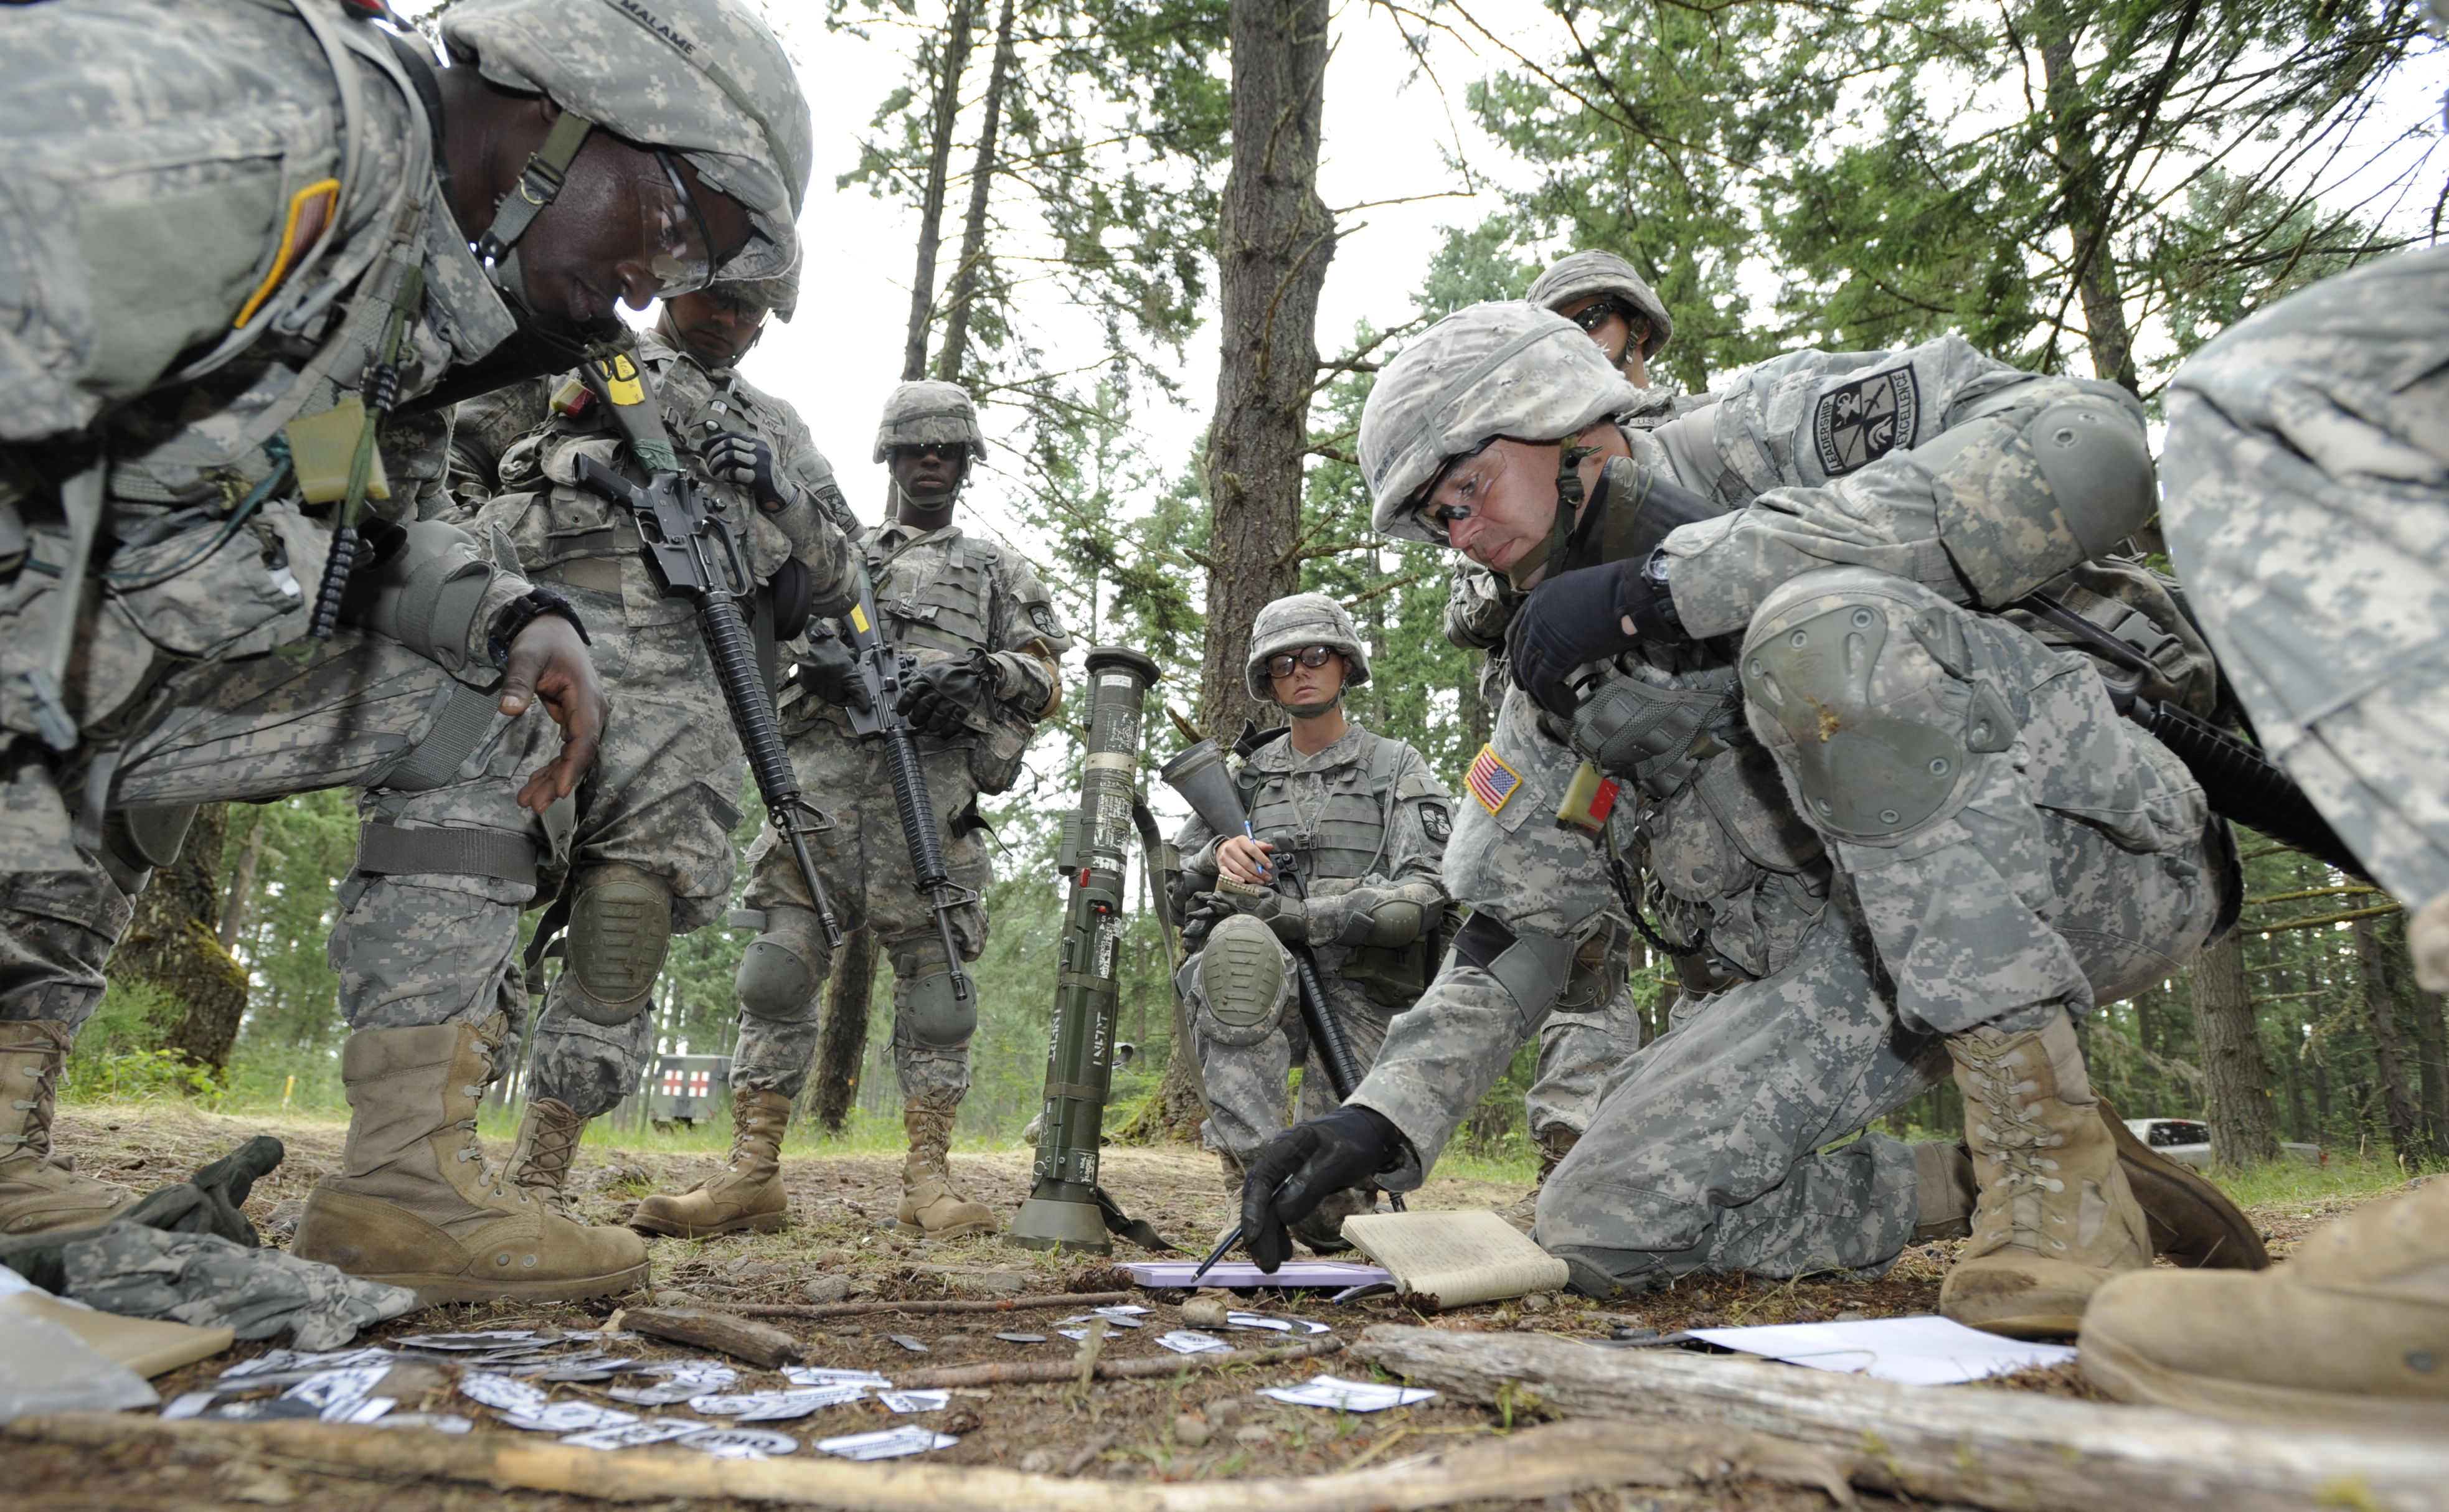 U.S. Army photo by Gary Tarleton.